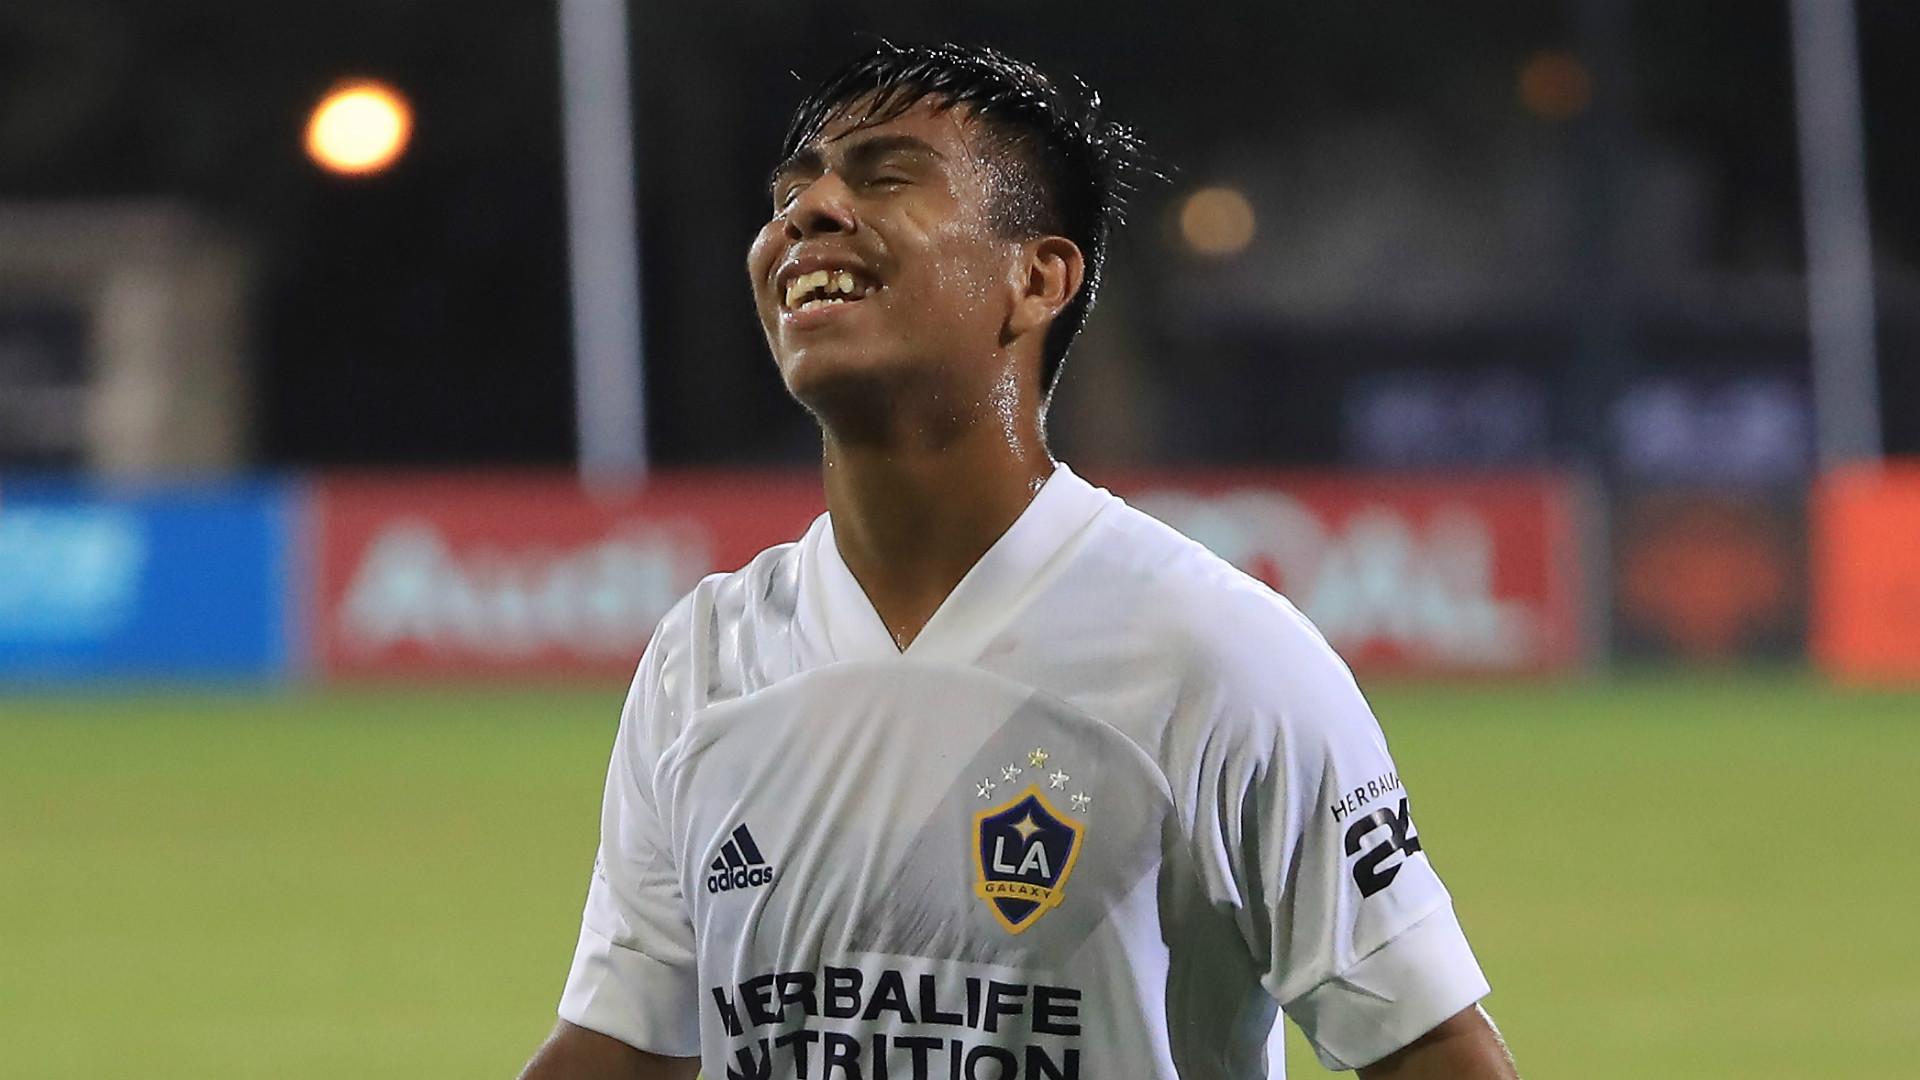 LA Galaxy sign Mexico star Alvarez to two-year contract extension